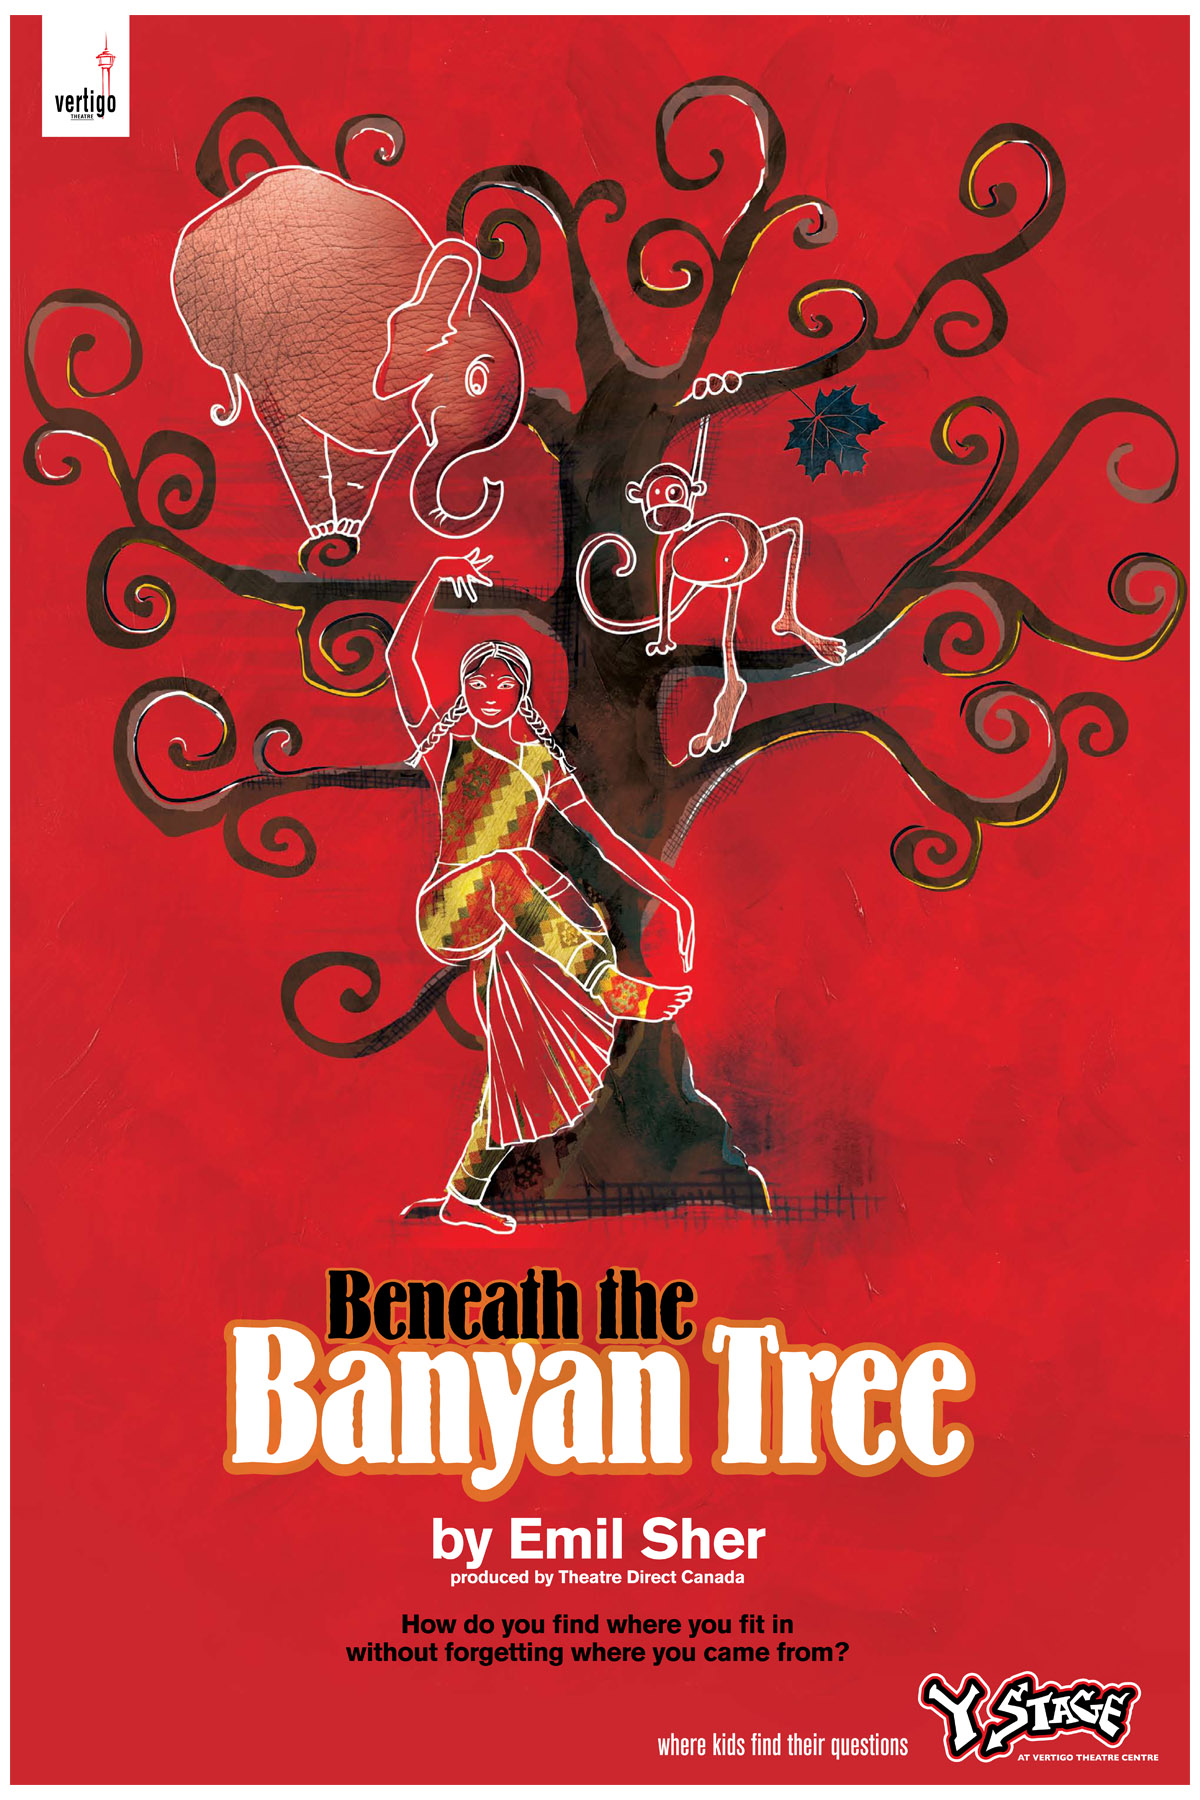 BENEATH THE BANYAN TREE